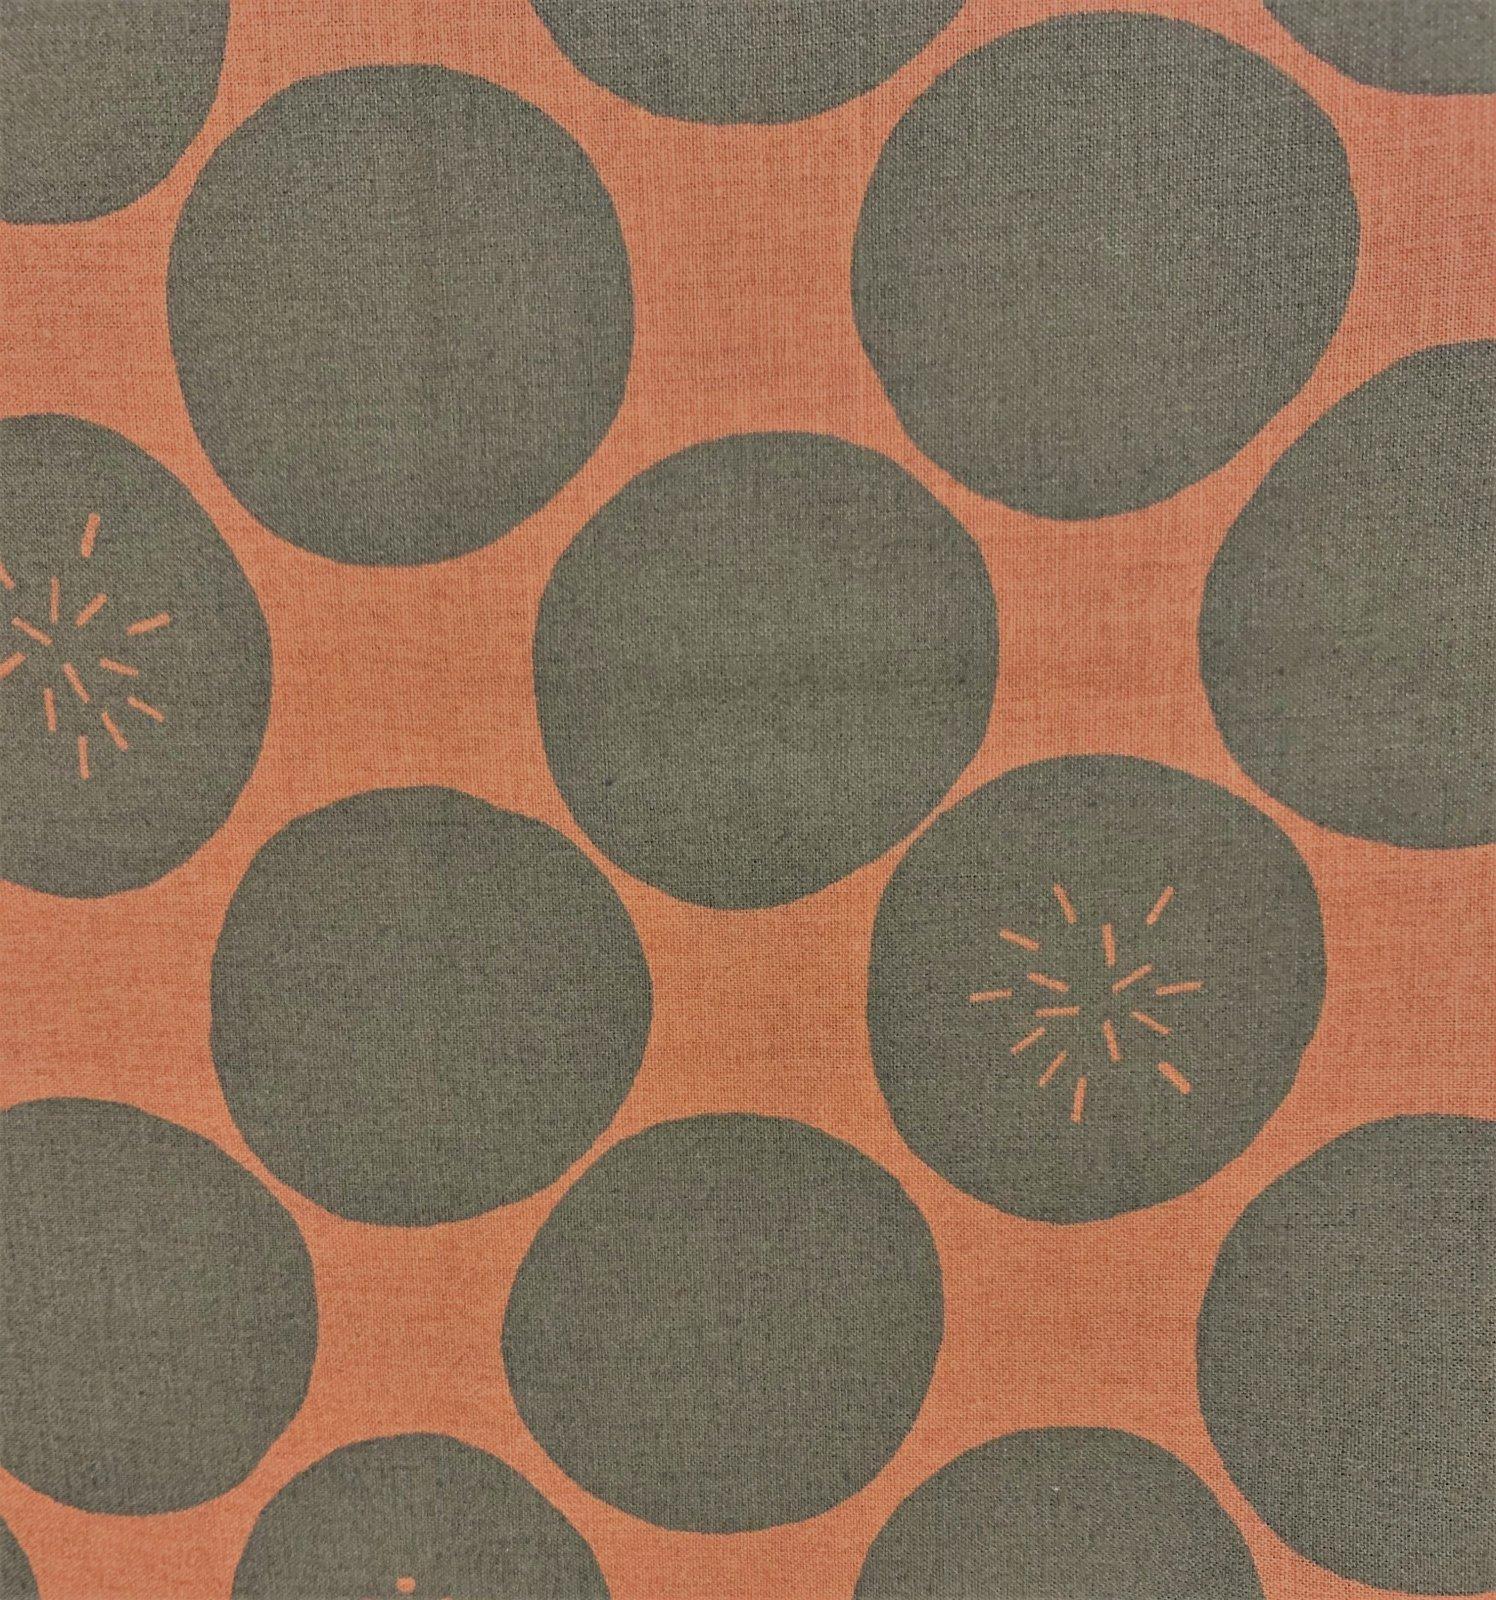 Handworks - Oversized Spot - Chocolate on Rust